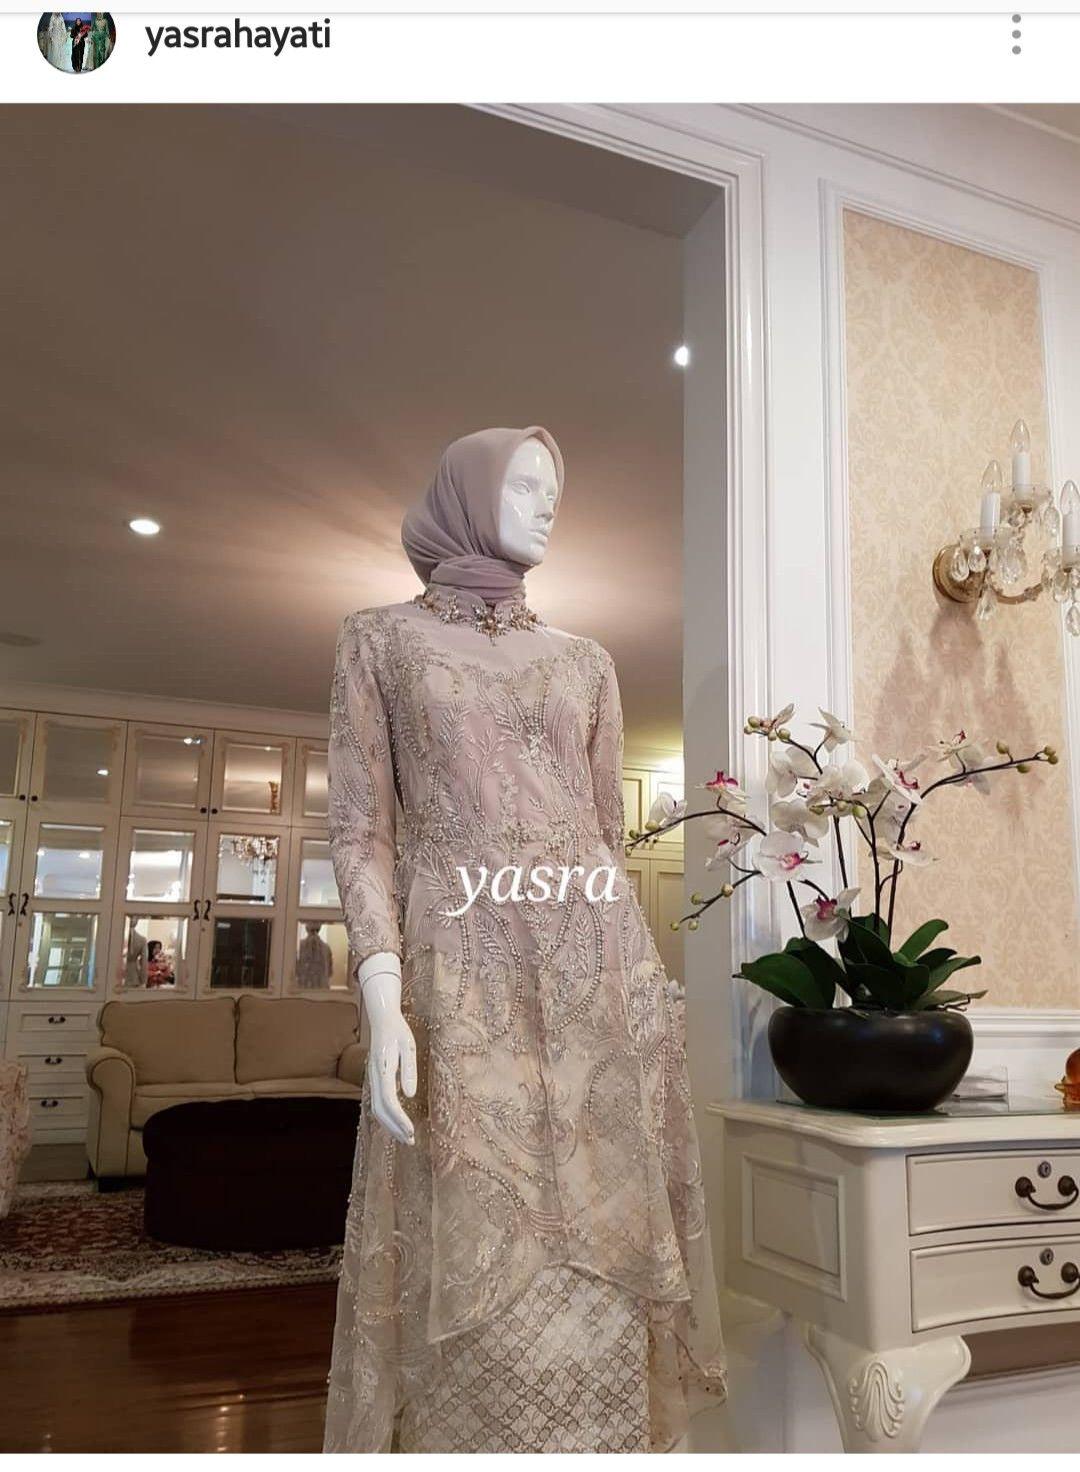 By Yasra  Model baju wanita, Wanita, Model pakaian muslim